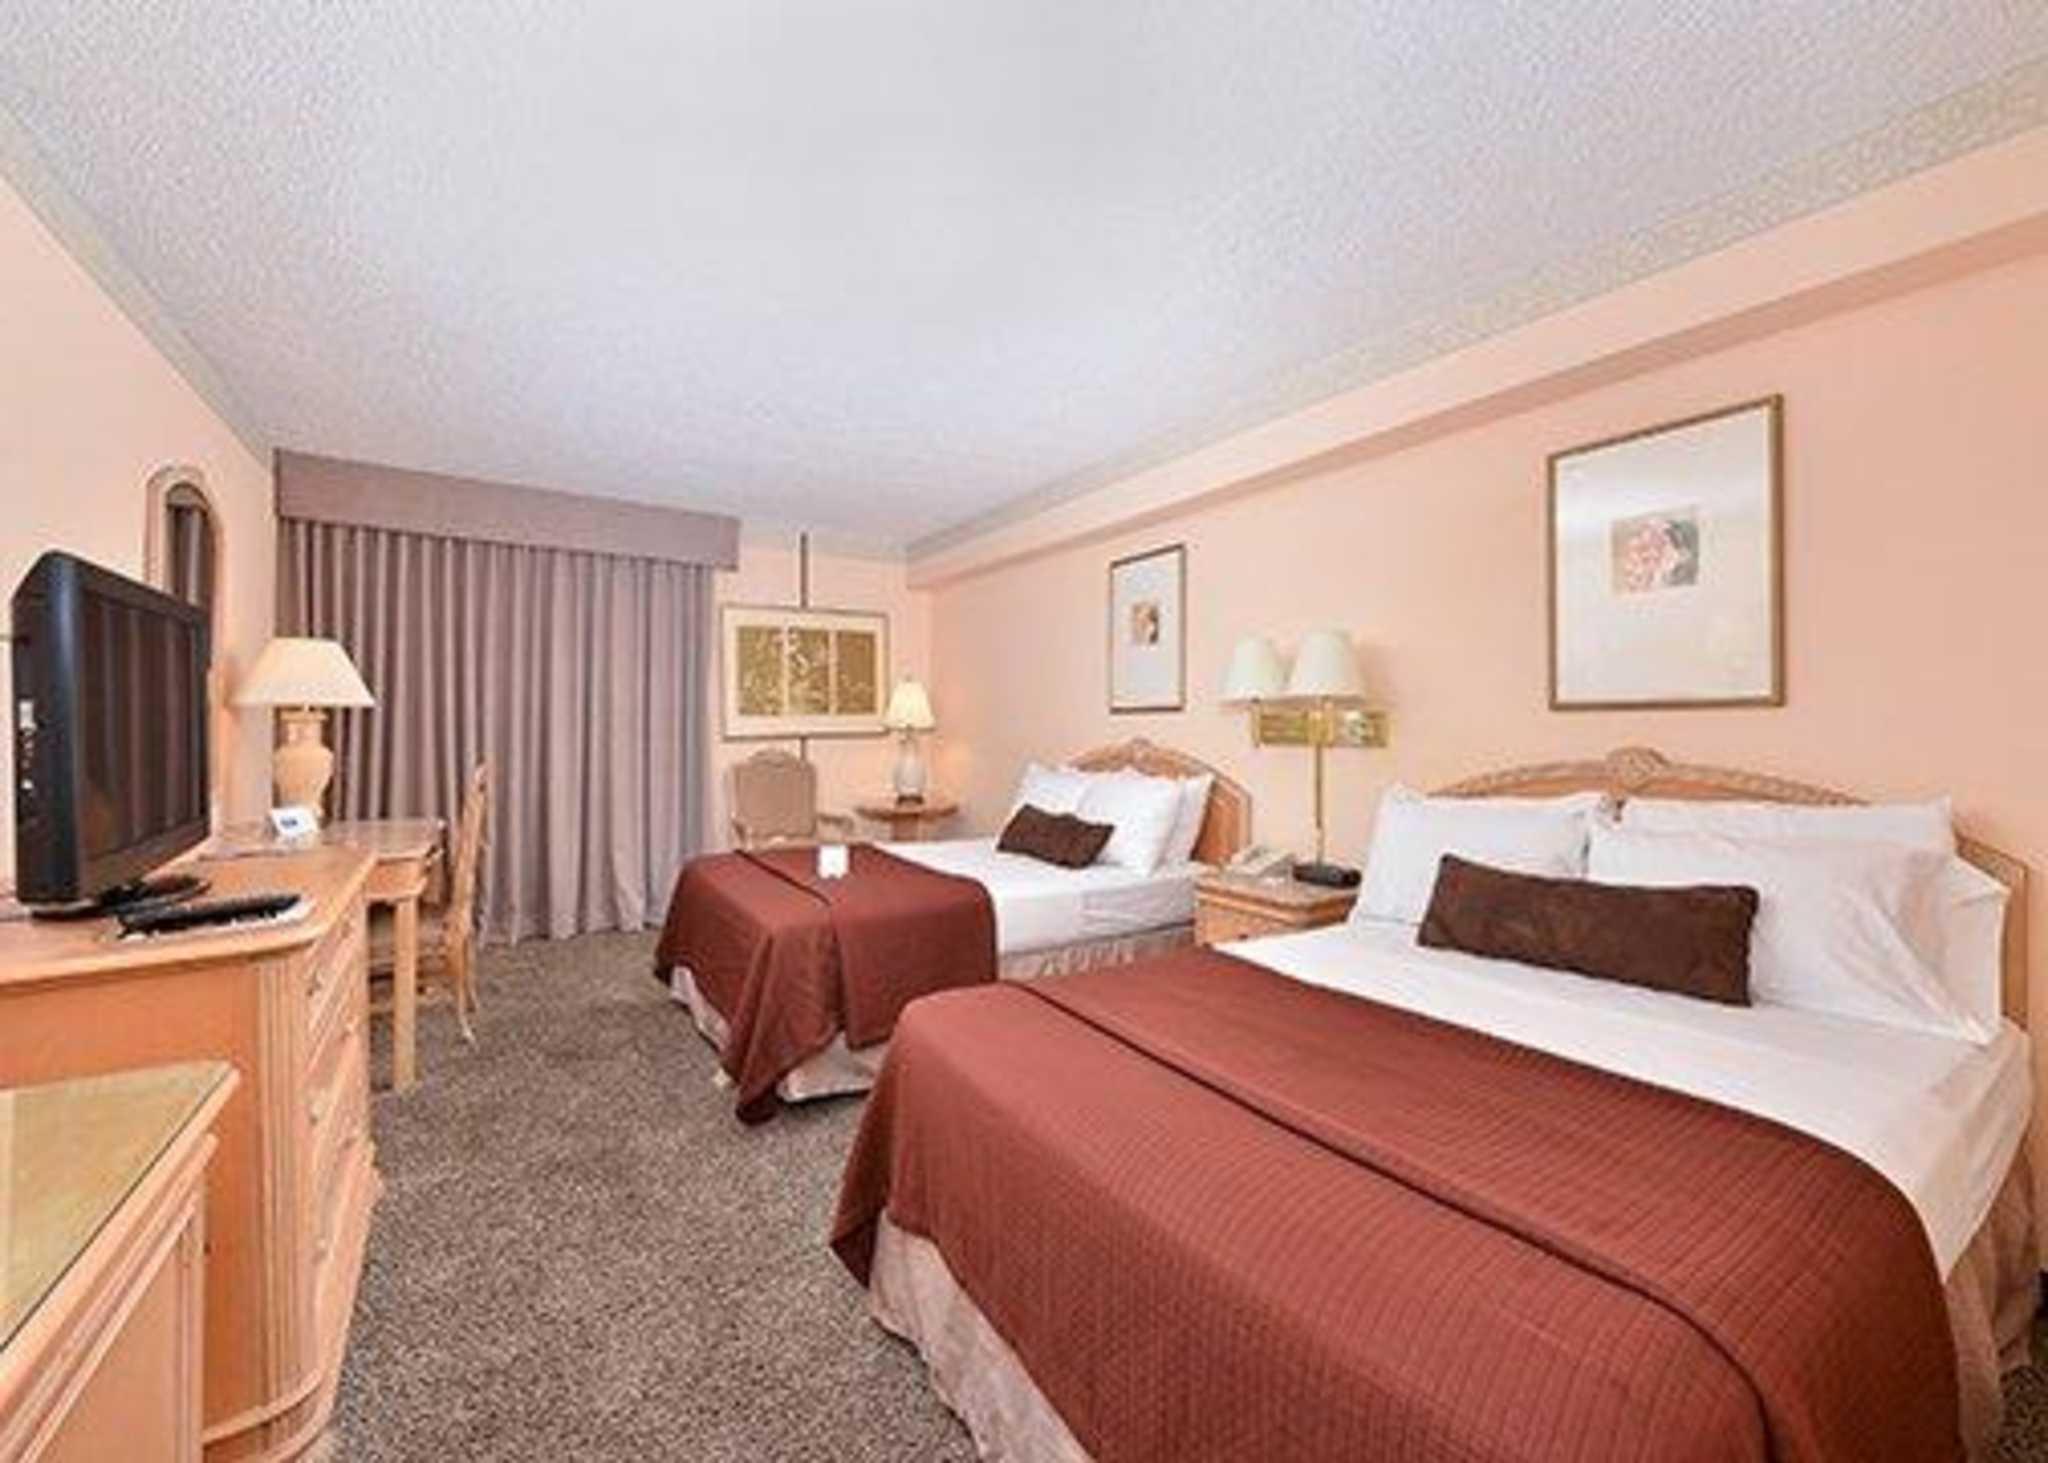 Rodeway Inn image 12